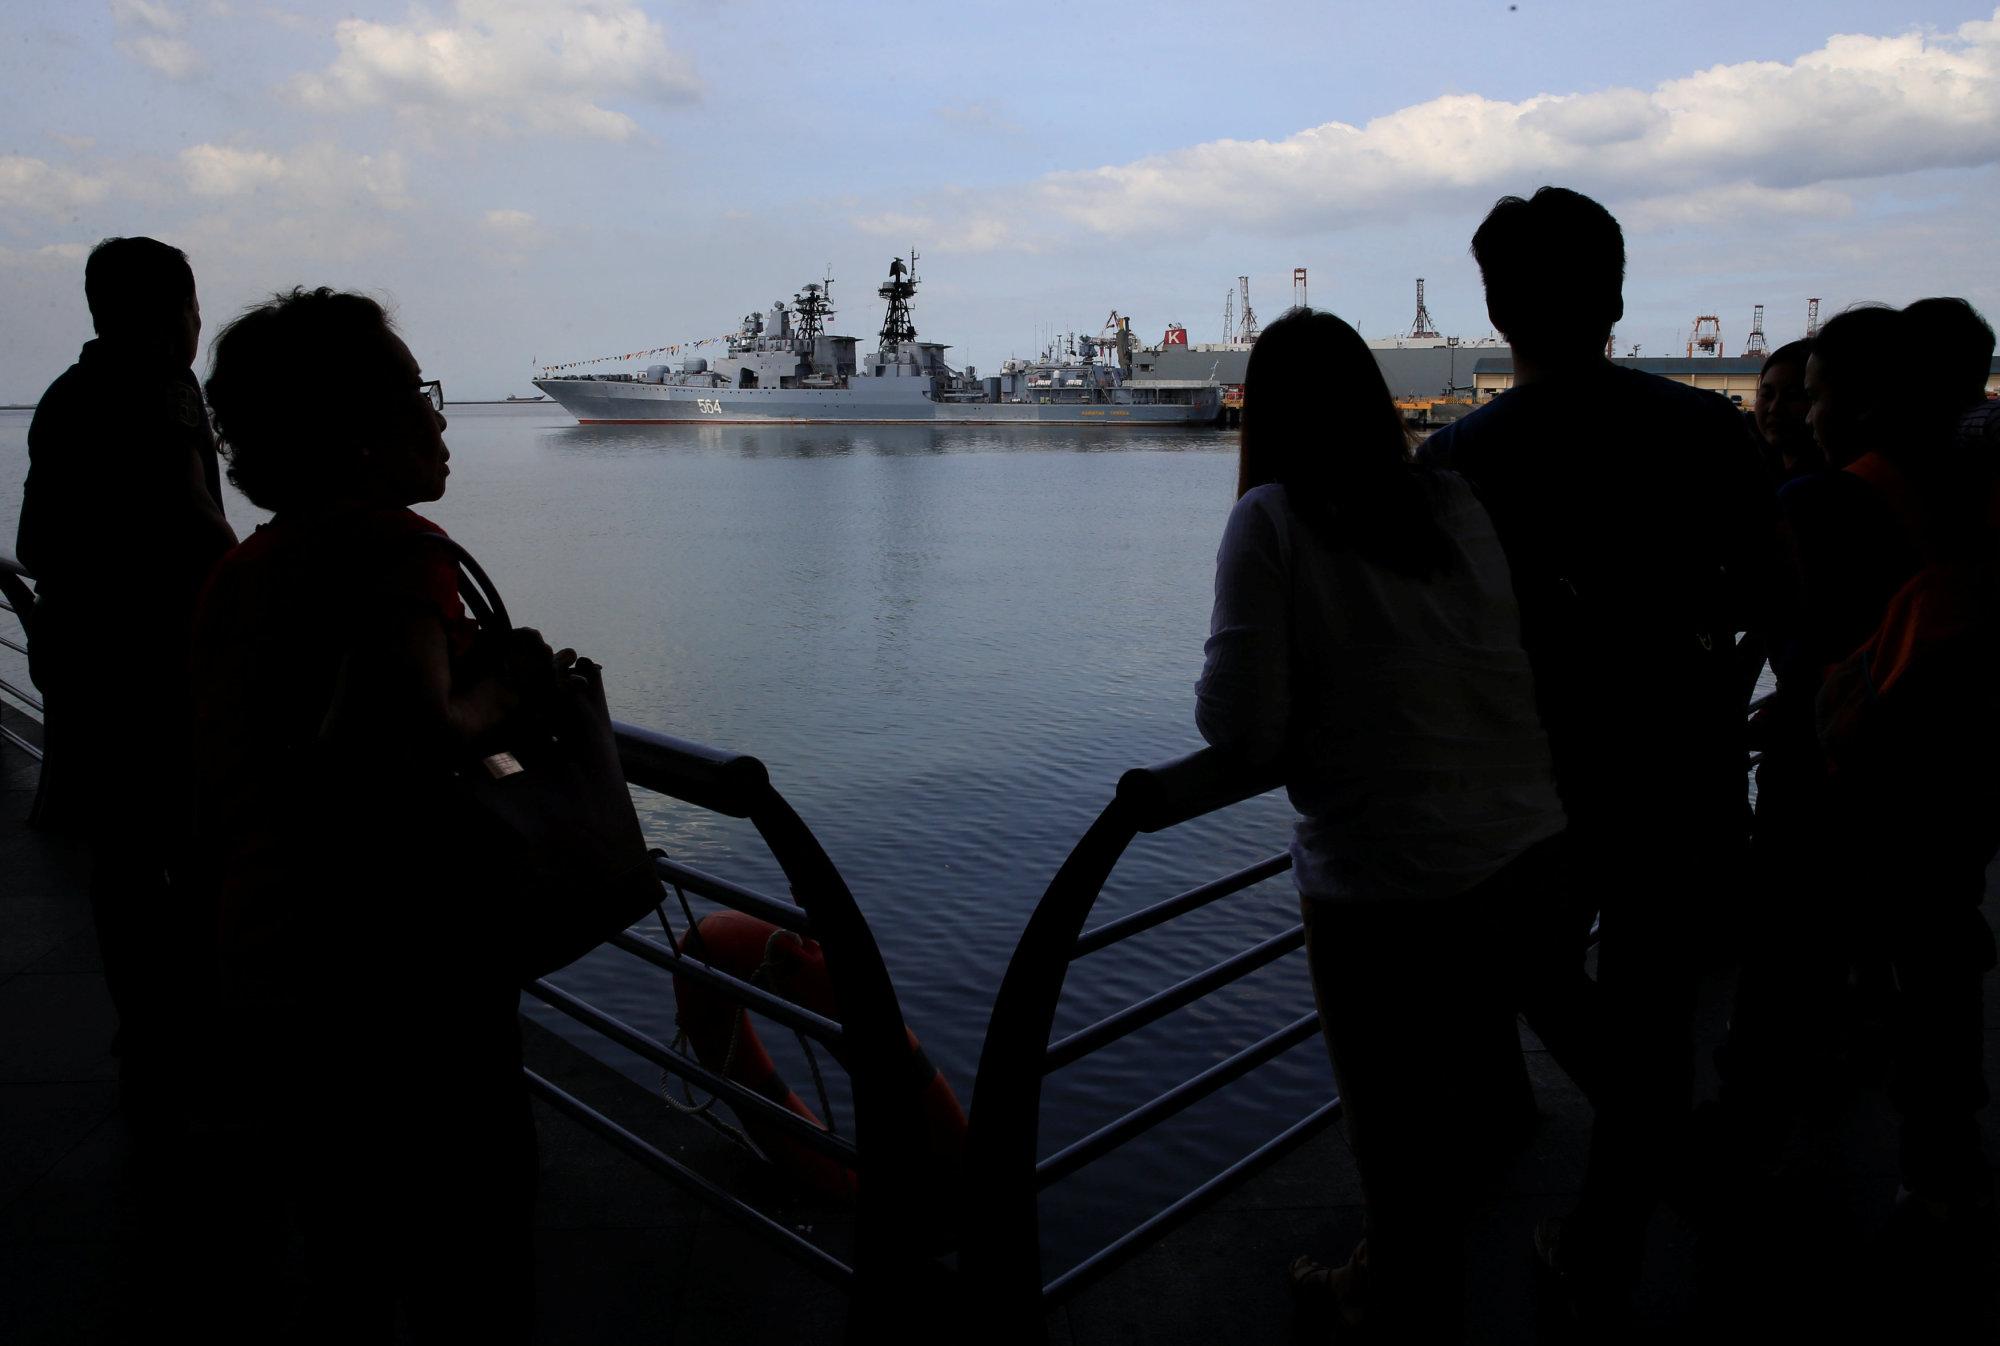 http://45eq7vmb9bj1ratu11zv1p19.wpengine.netdna-cdn.com/wp-content/uploads/2017/01/manila-warships.jpg